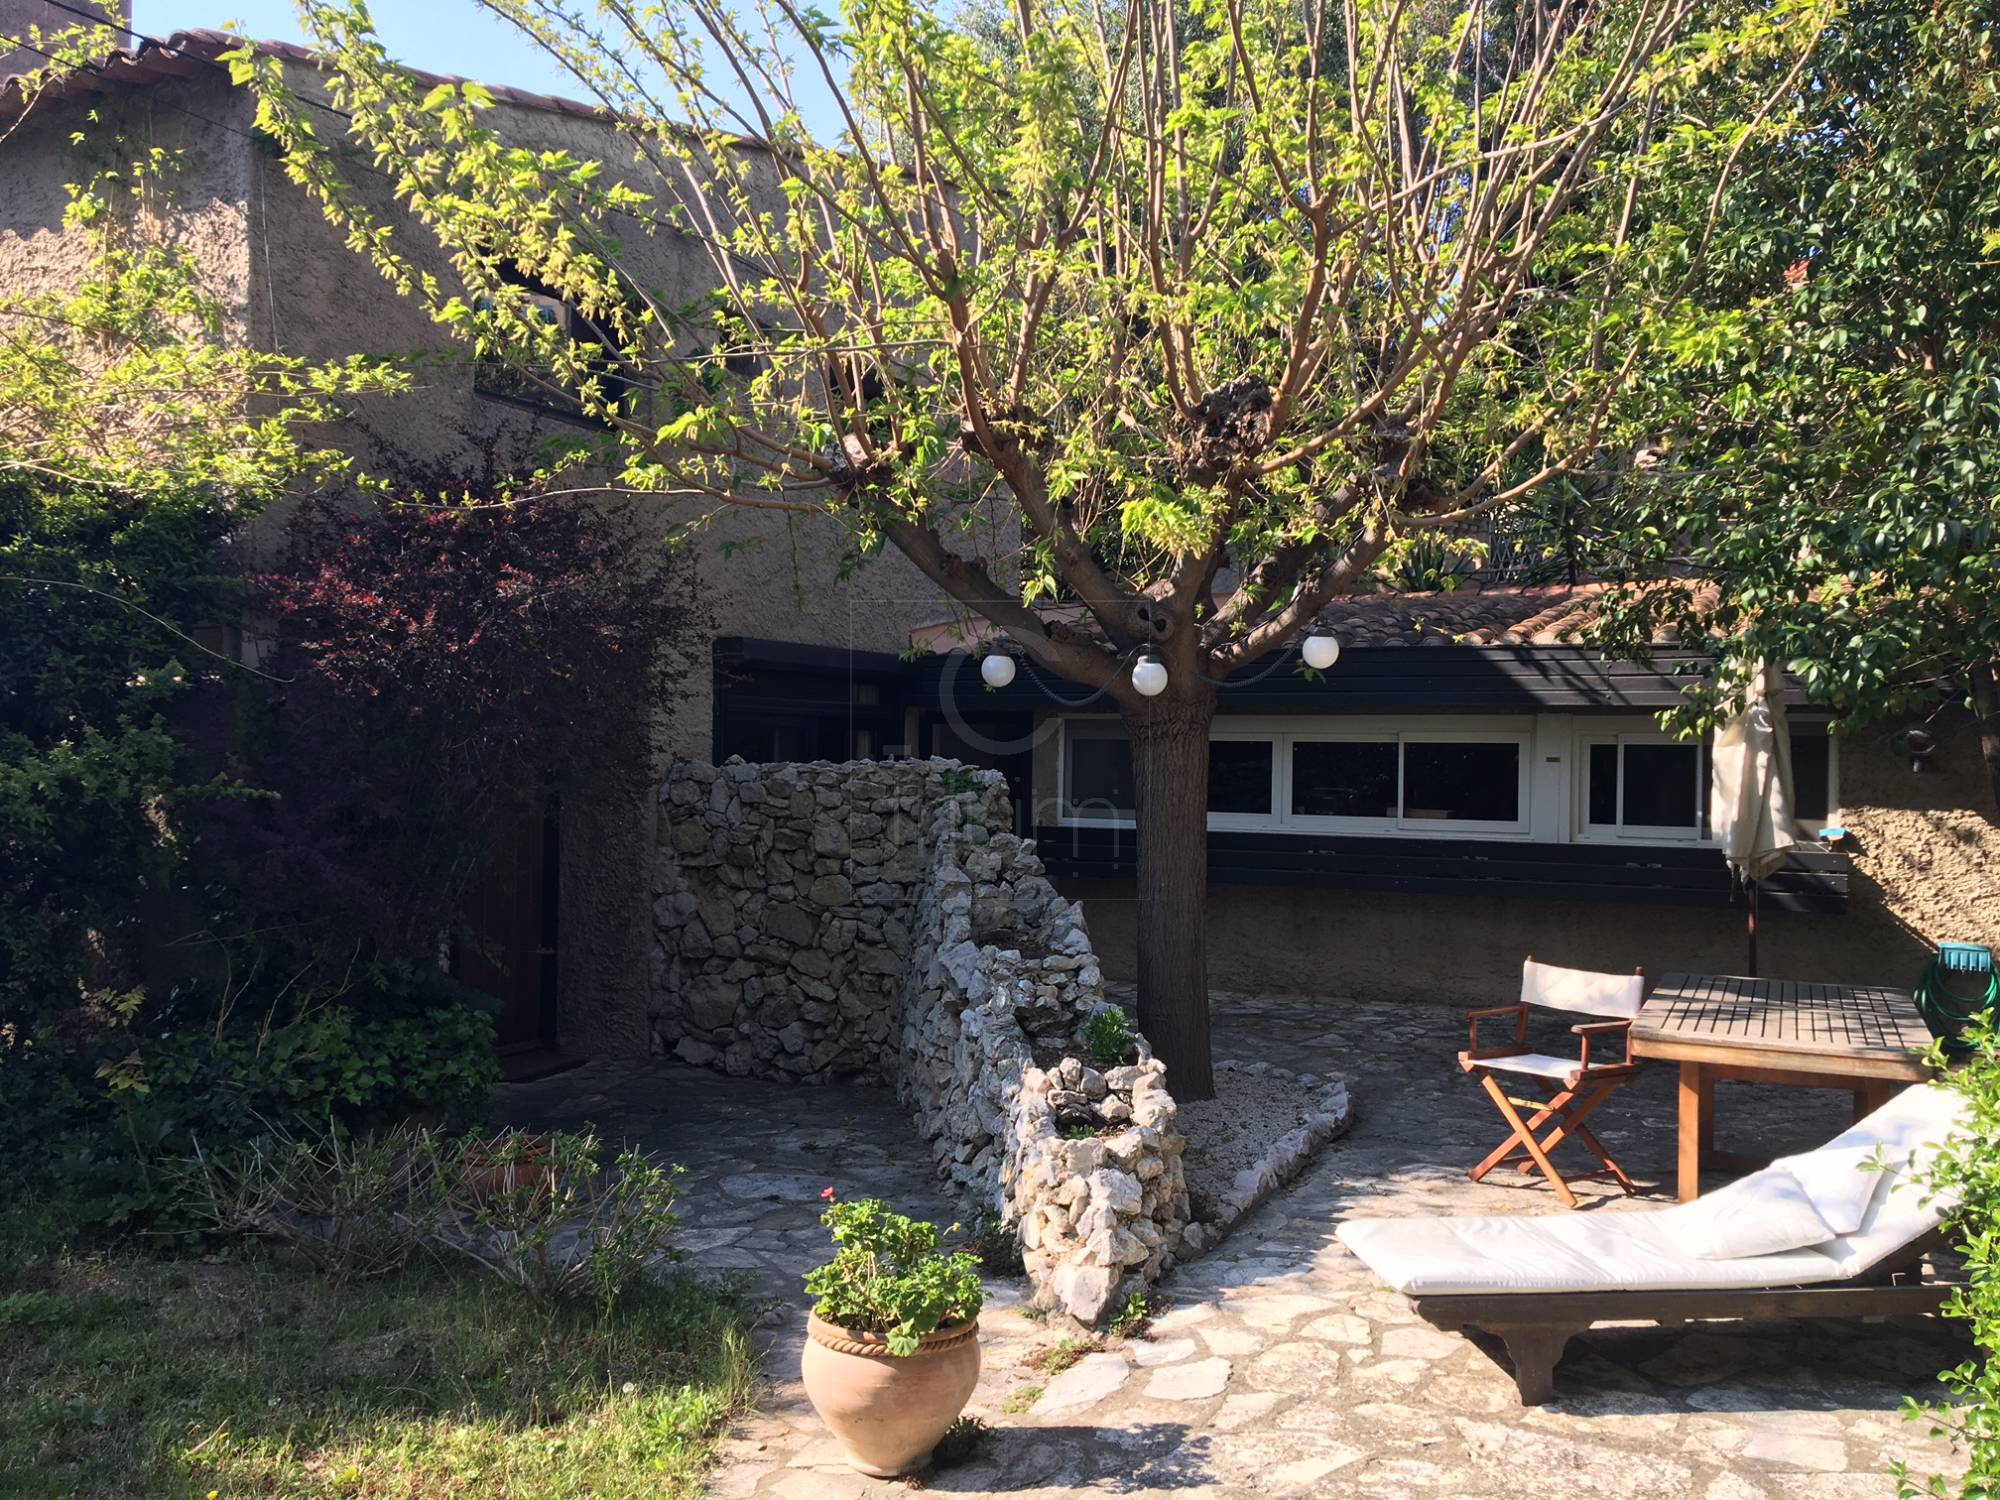 Vente maison marseille 7e jardin terrasse parking t5 f5 for Terrasse marseille vente